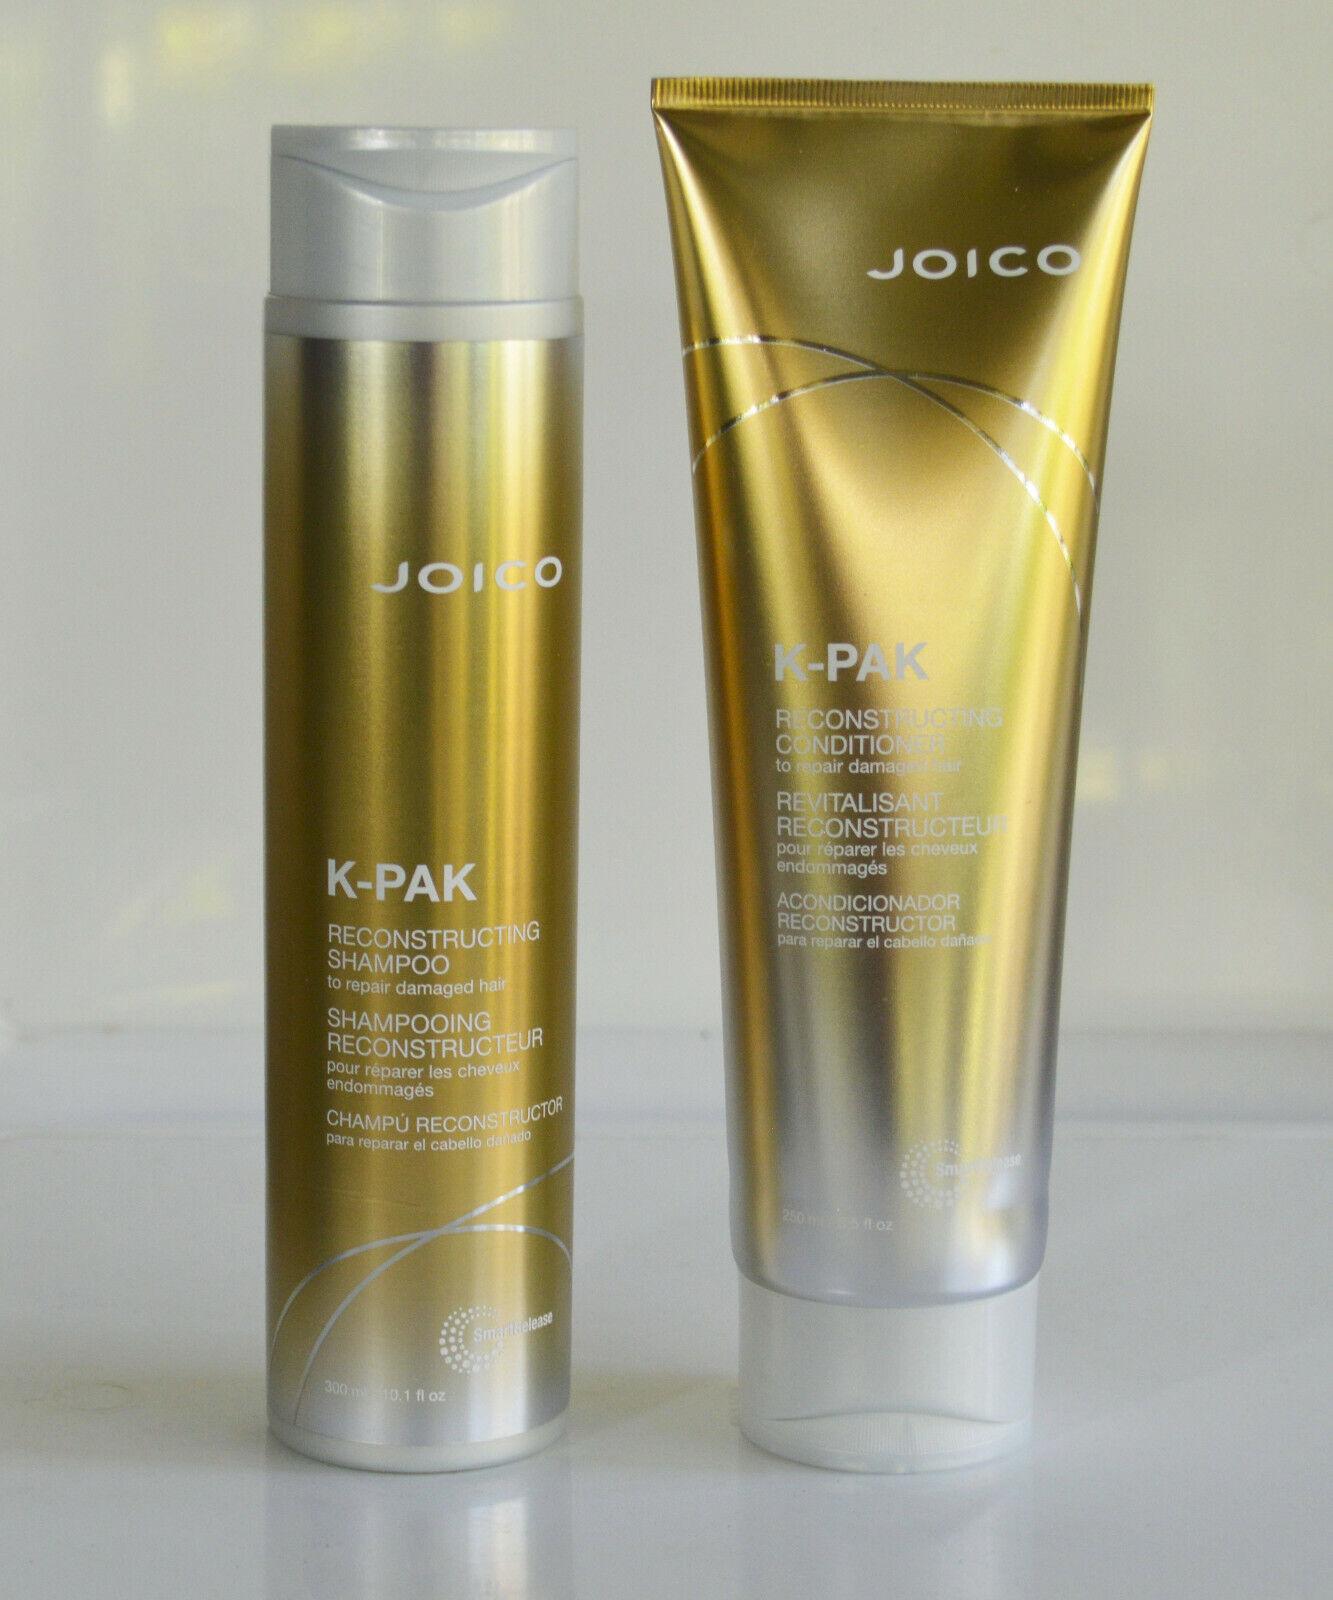 k pak reconstruct shampoo and conditioner